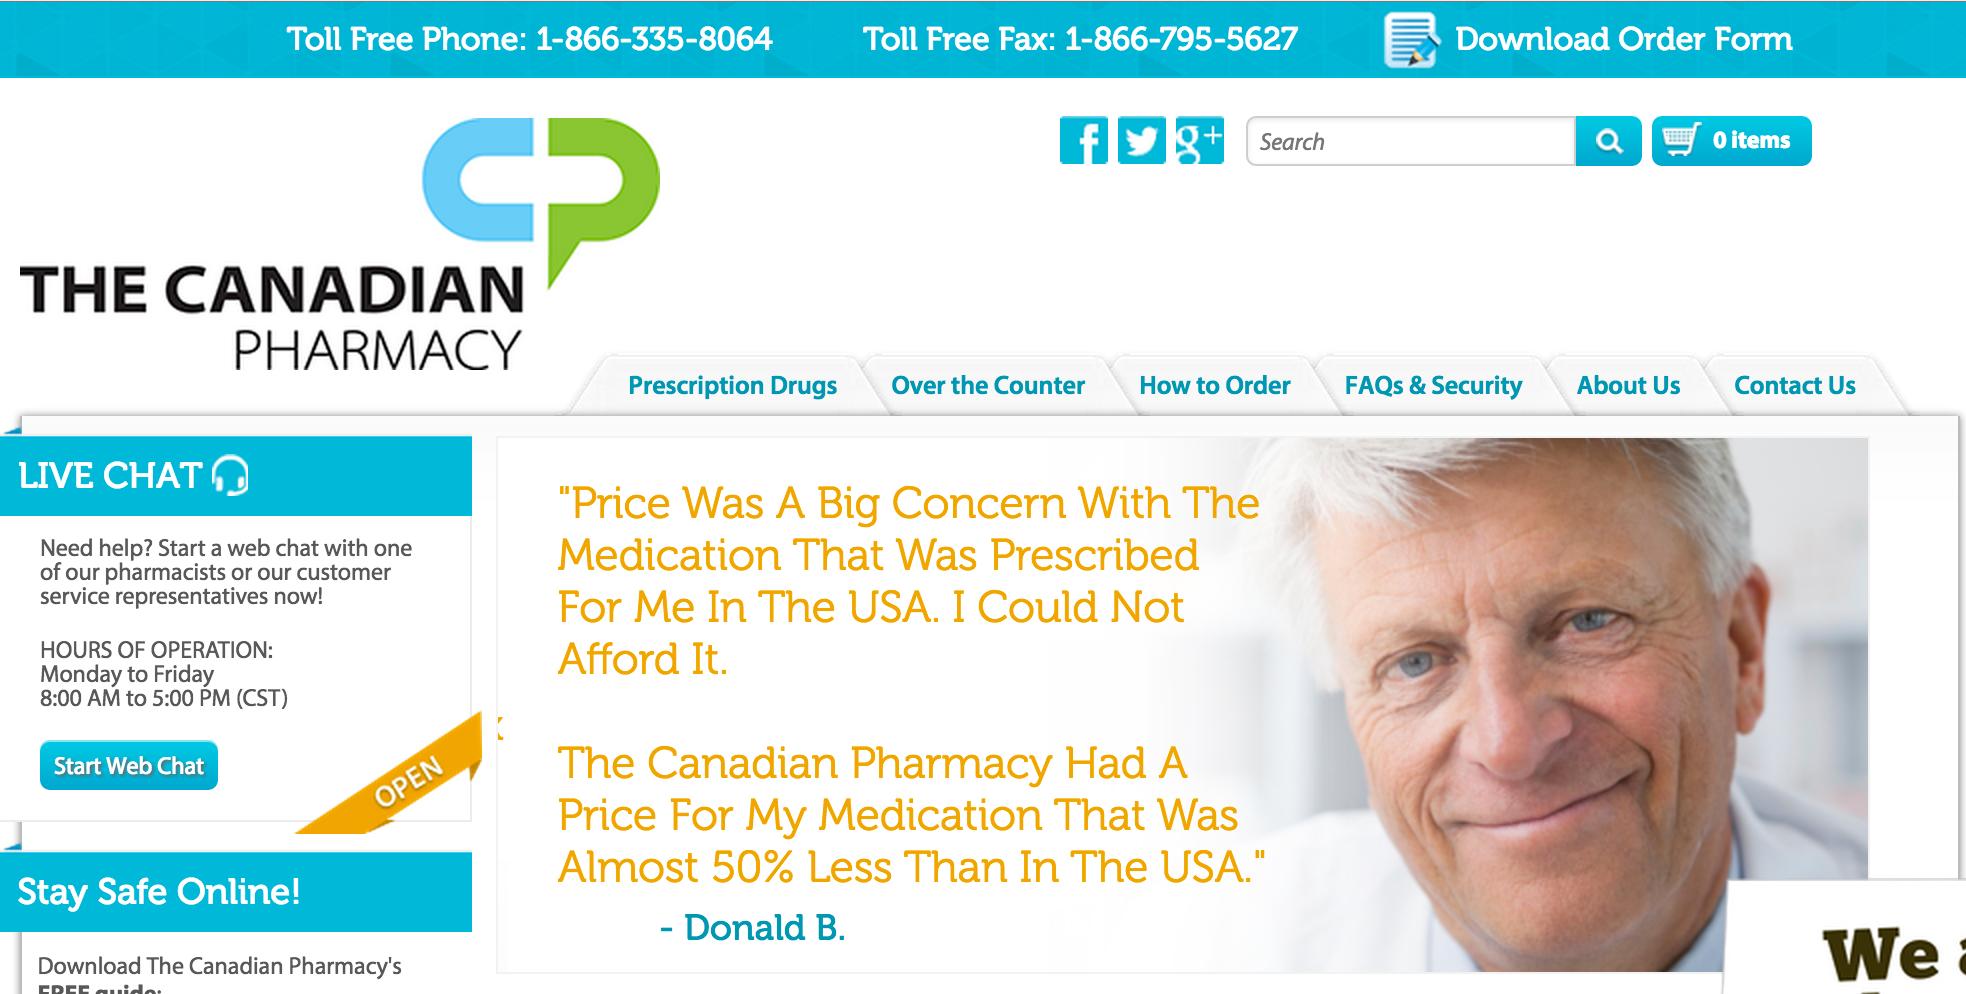 The Canadian Pharmacy - Pharmacy Affiliate Program